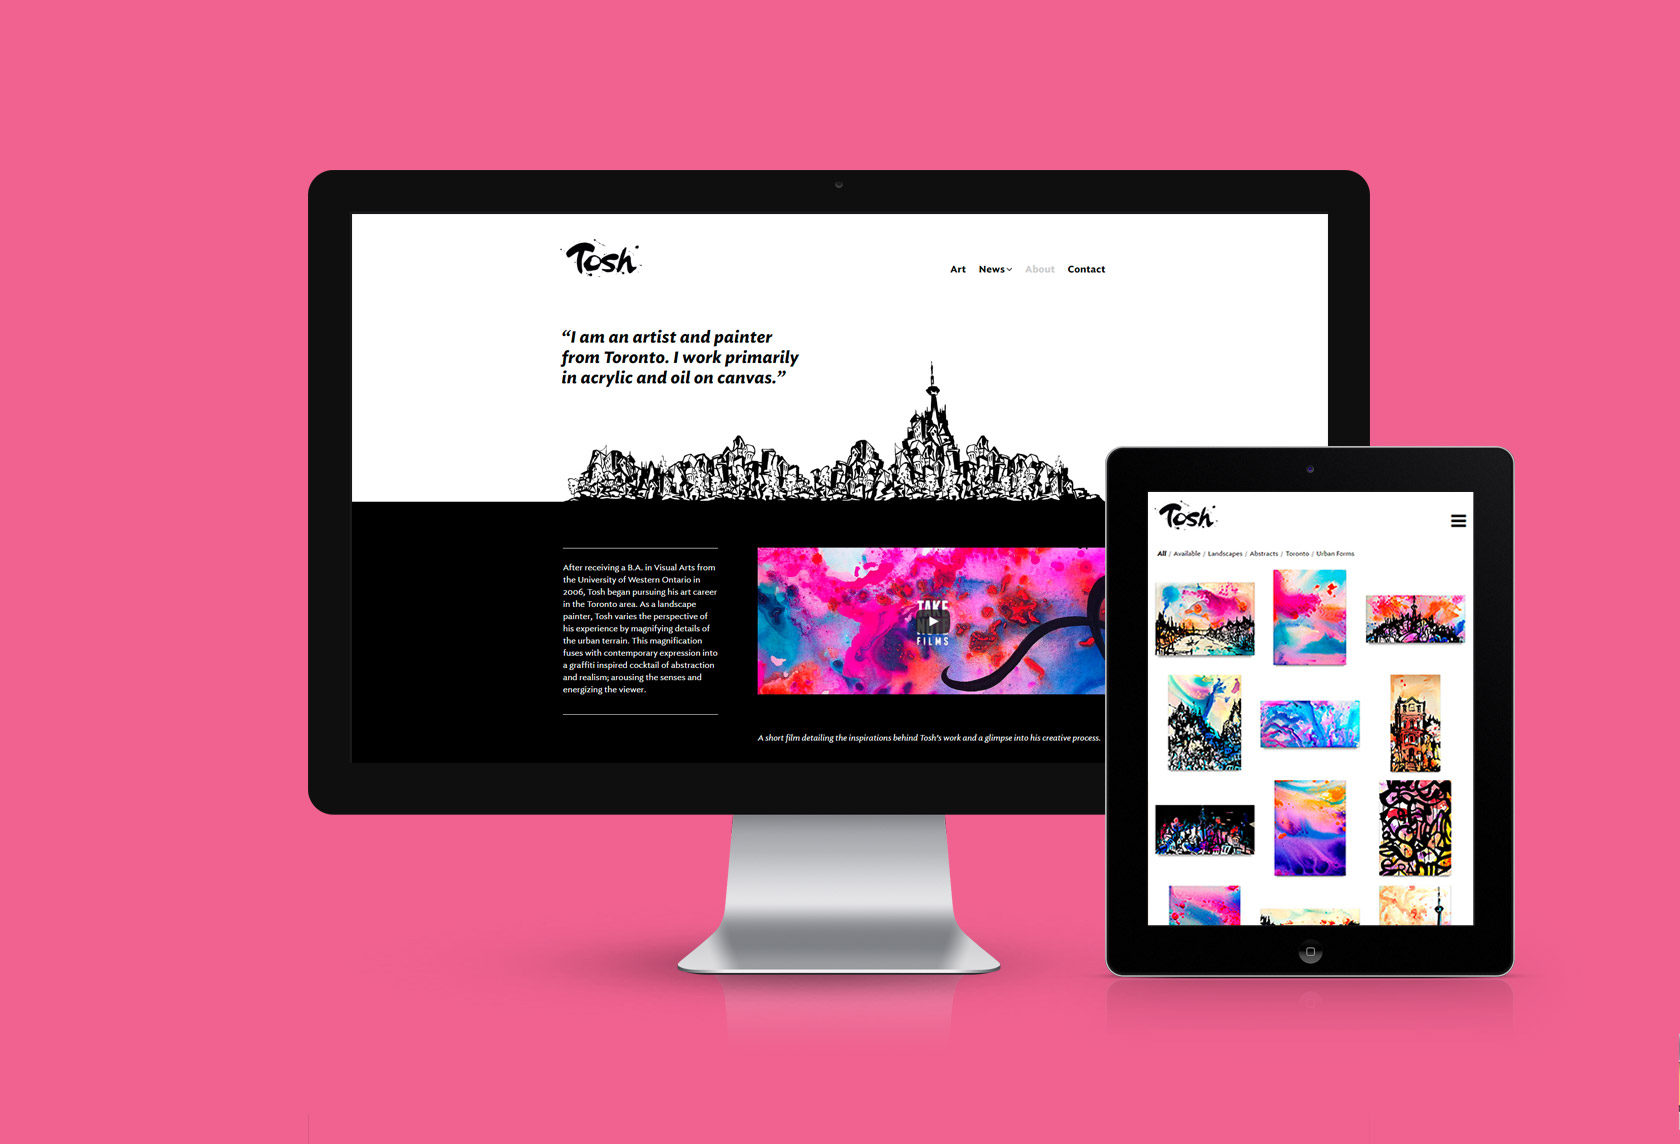 Tosh Jeffrey Website Design by Furia